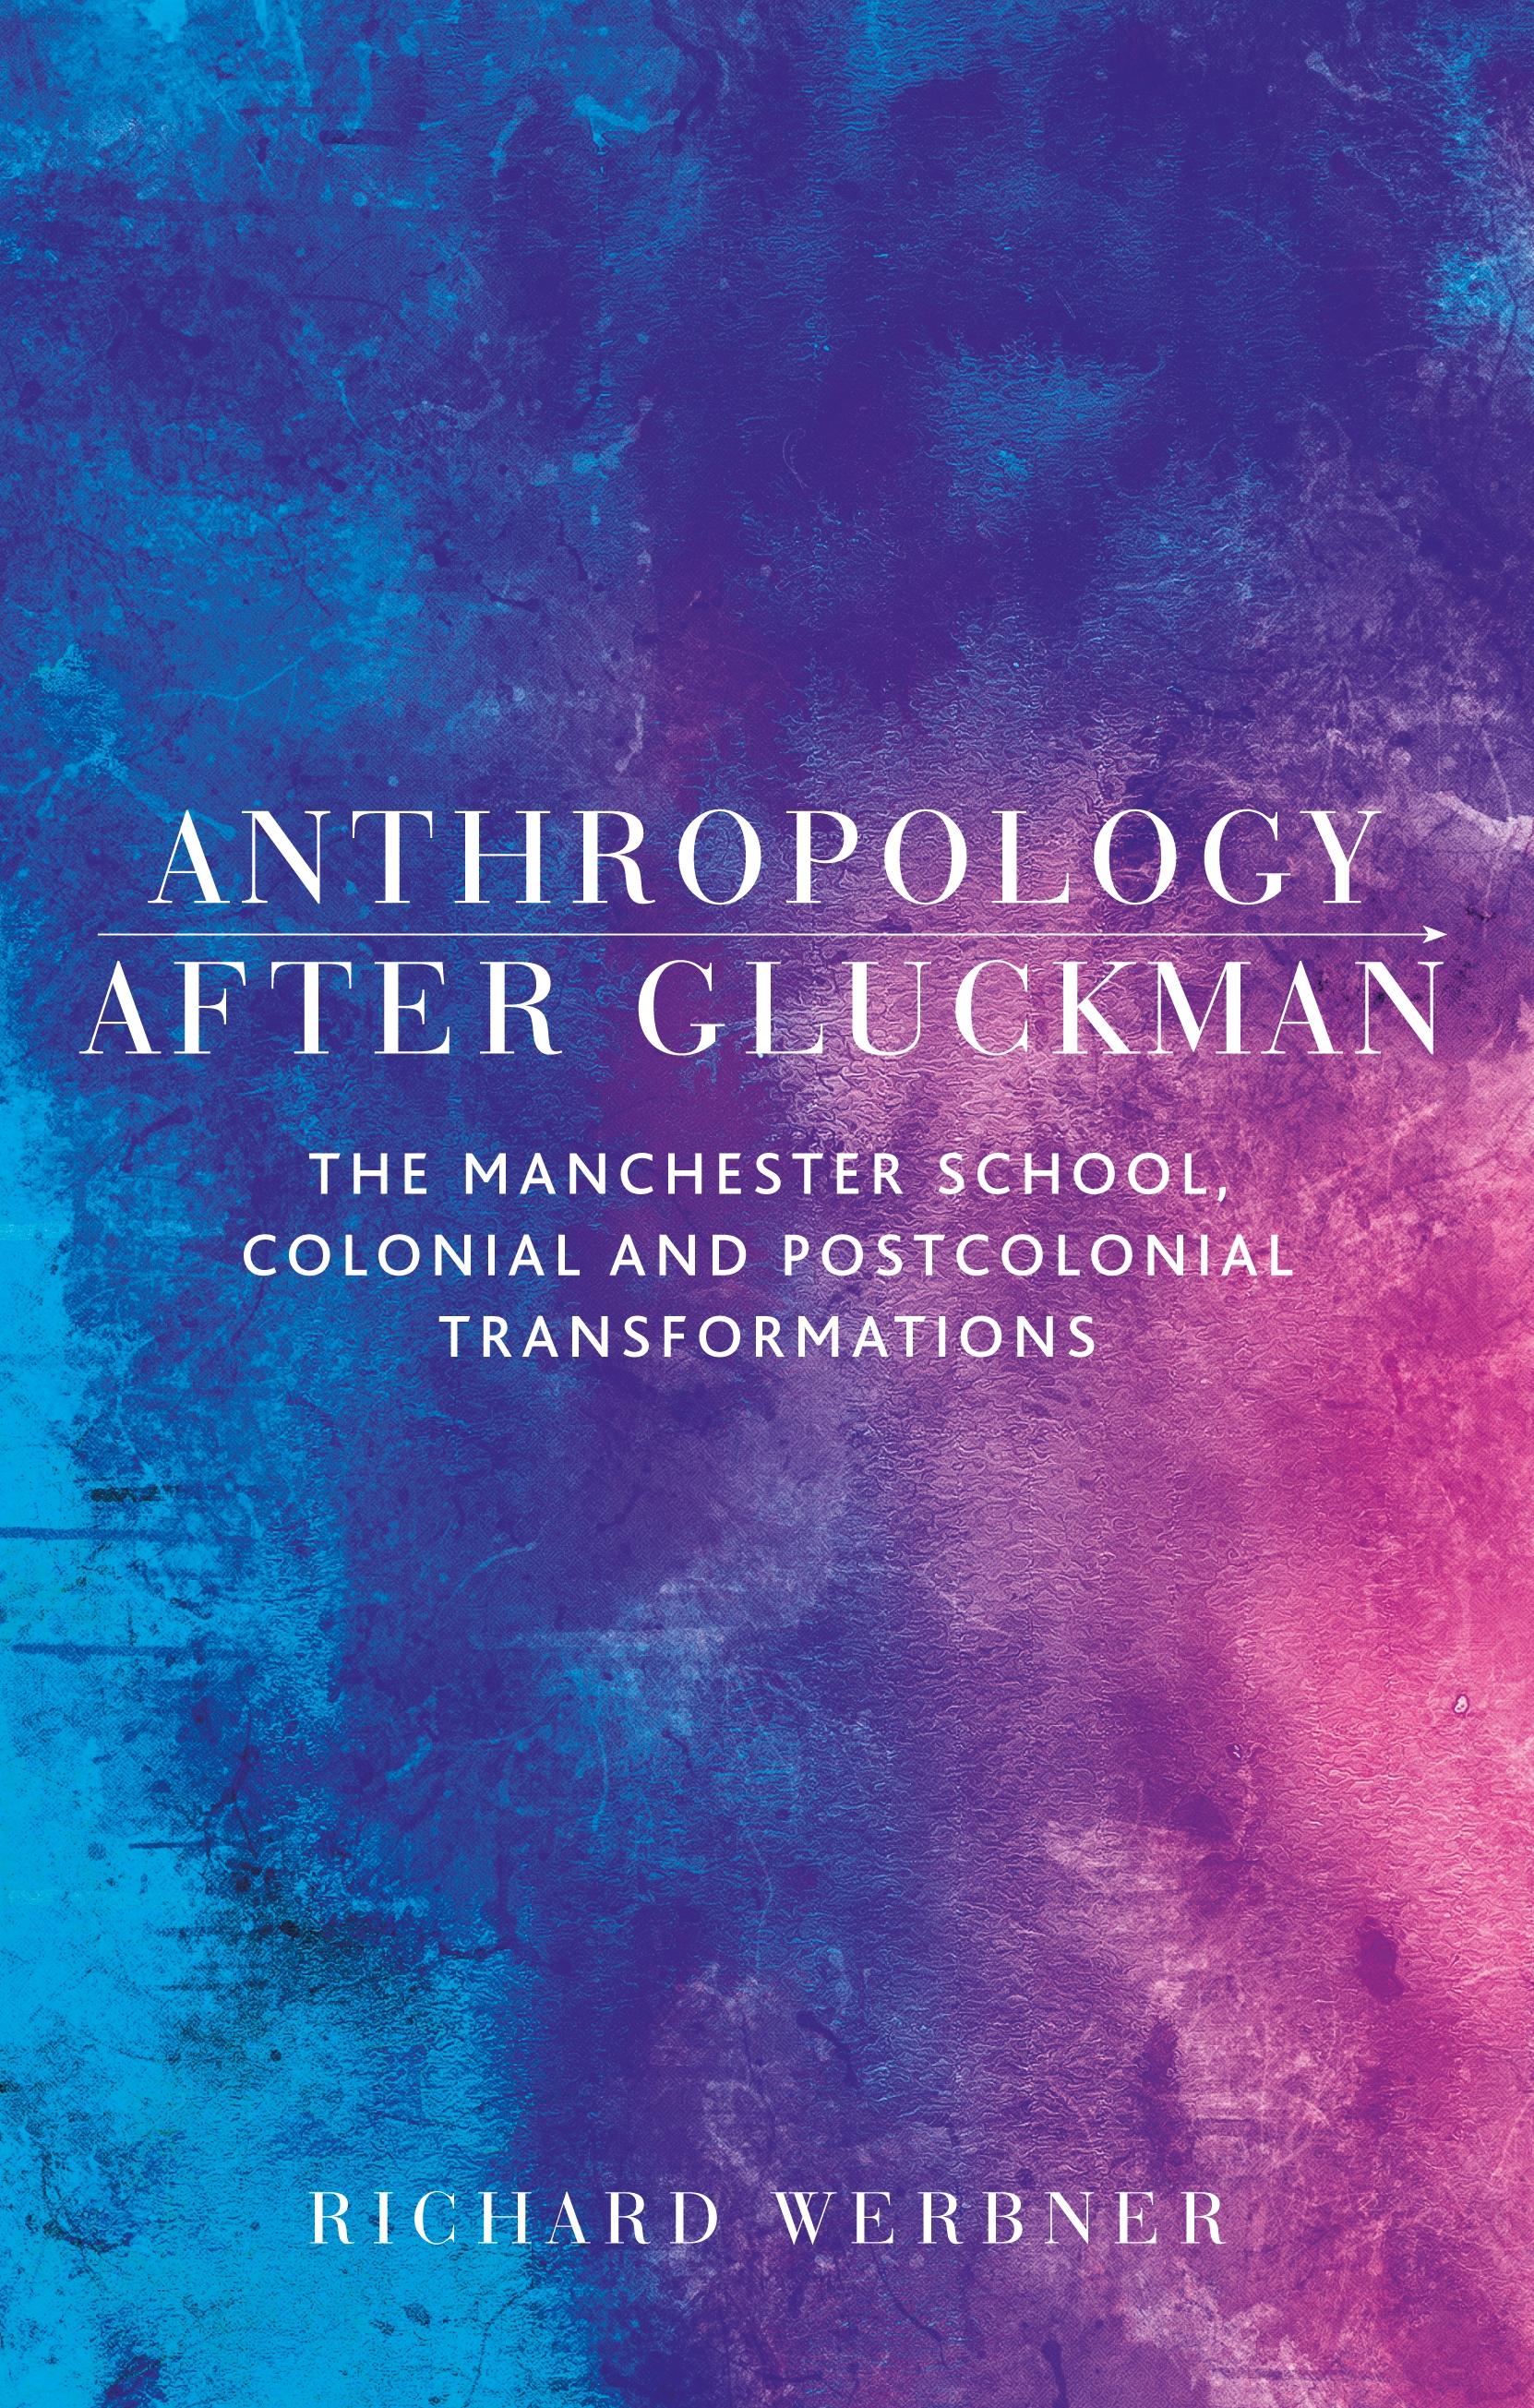 Anthropology after Gluckman – Q&A with Richard Werbner